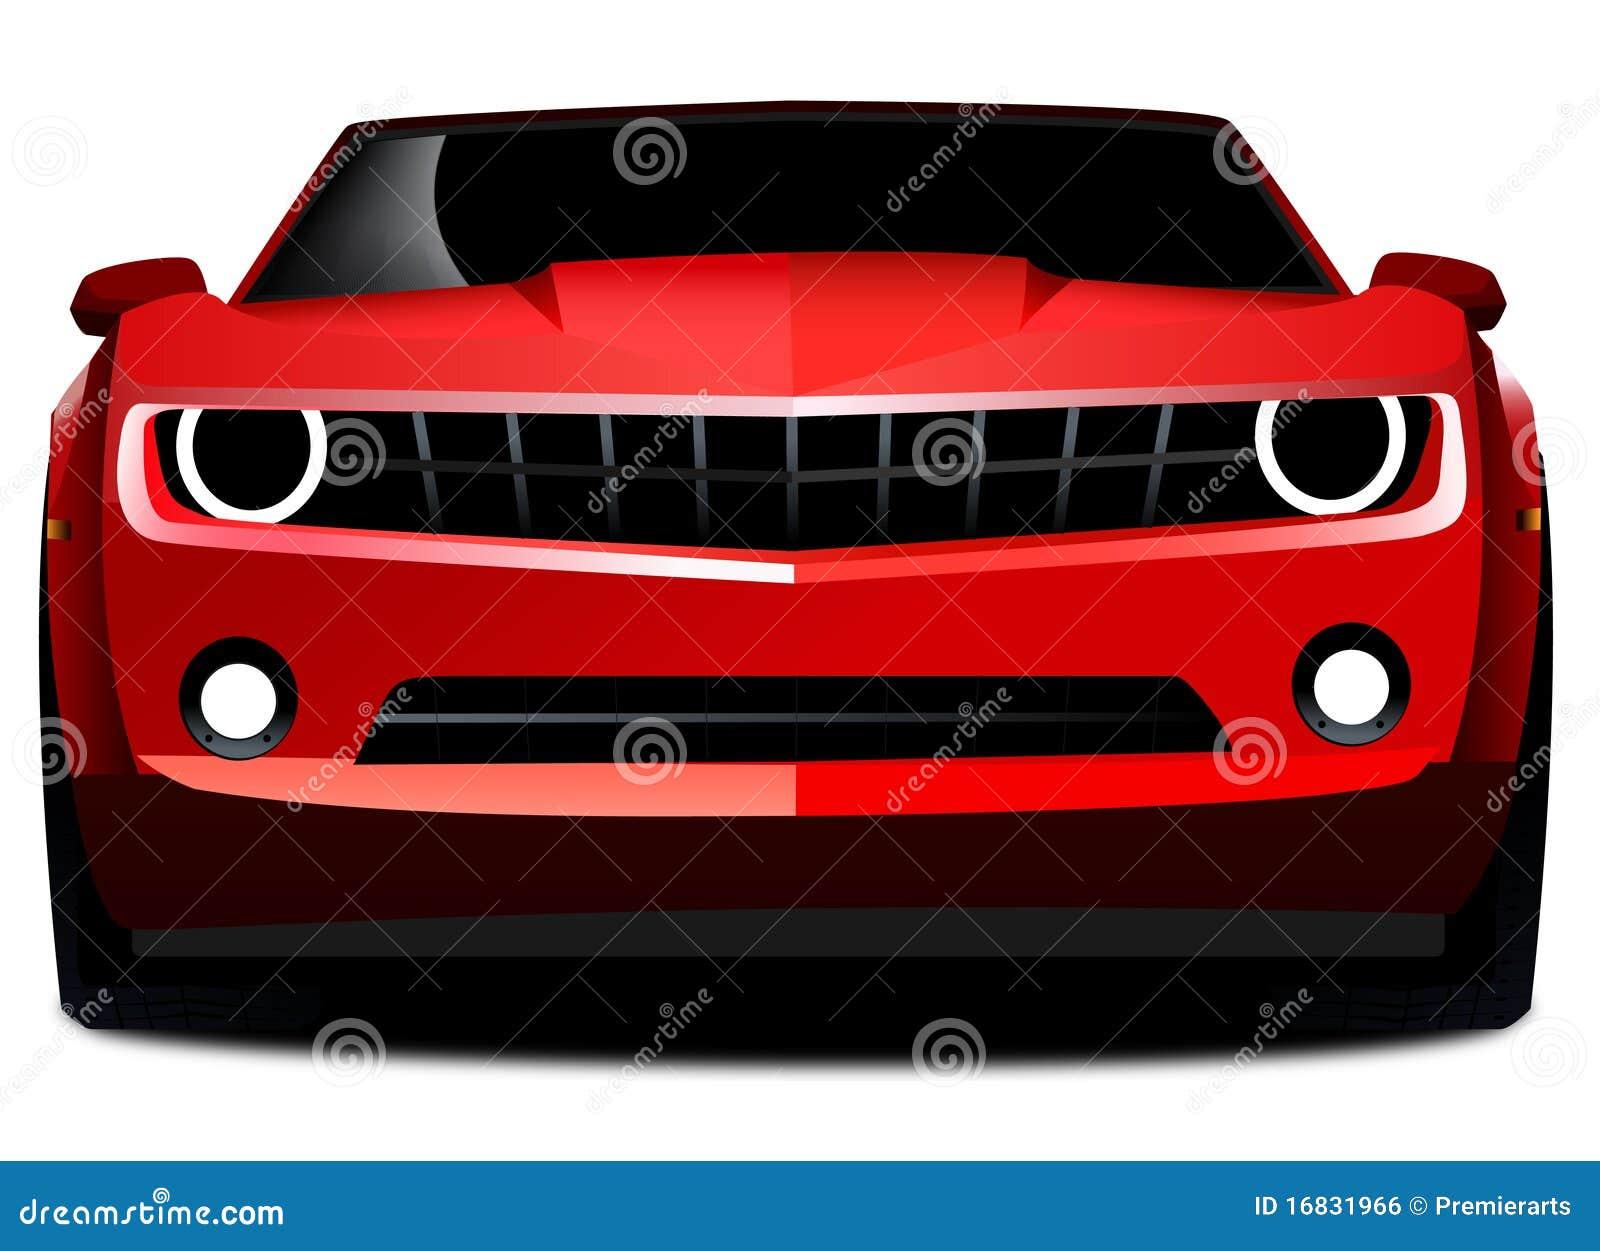 Chevrolet Red camaro sports car